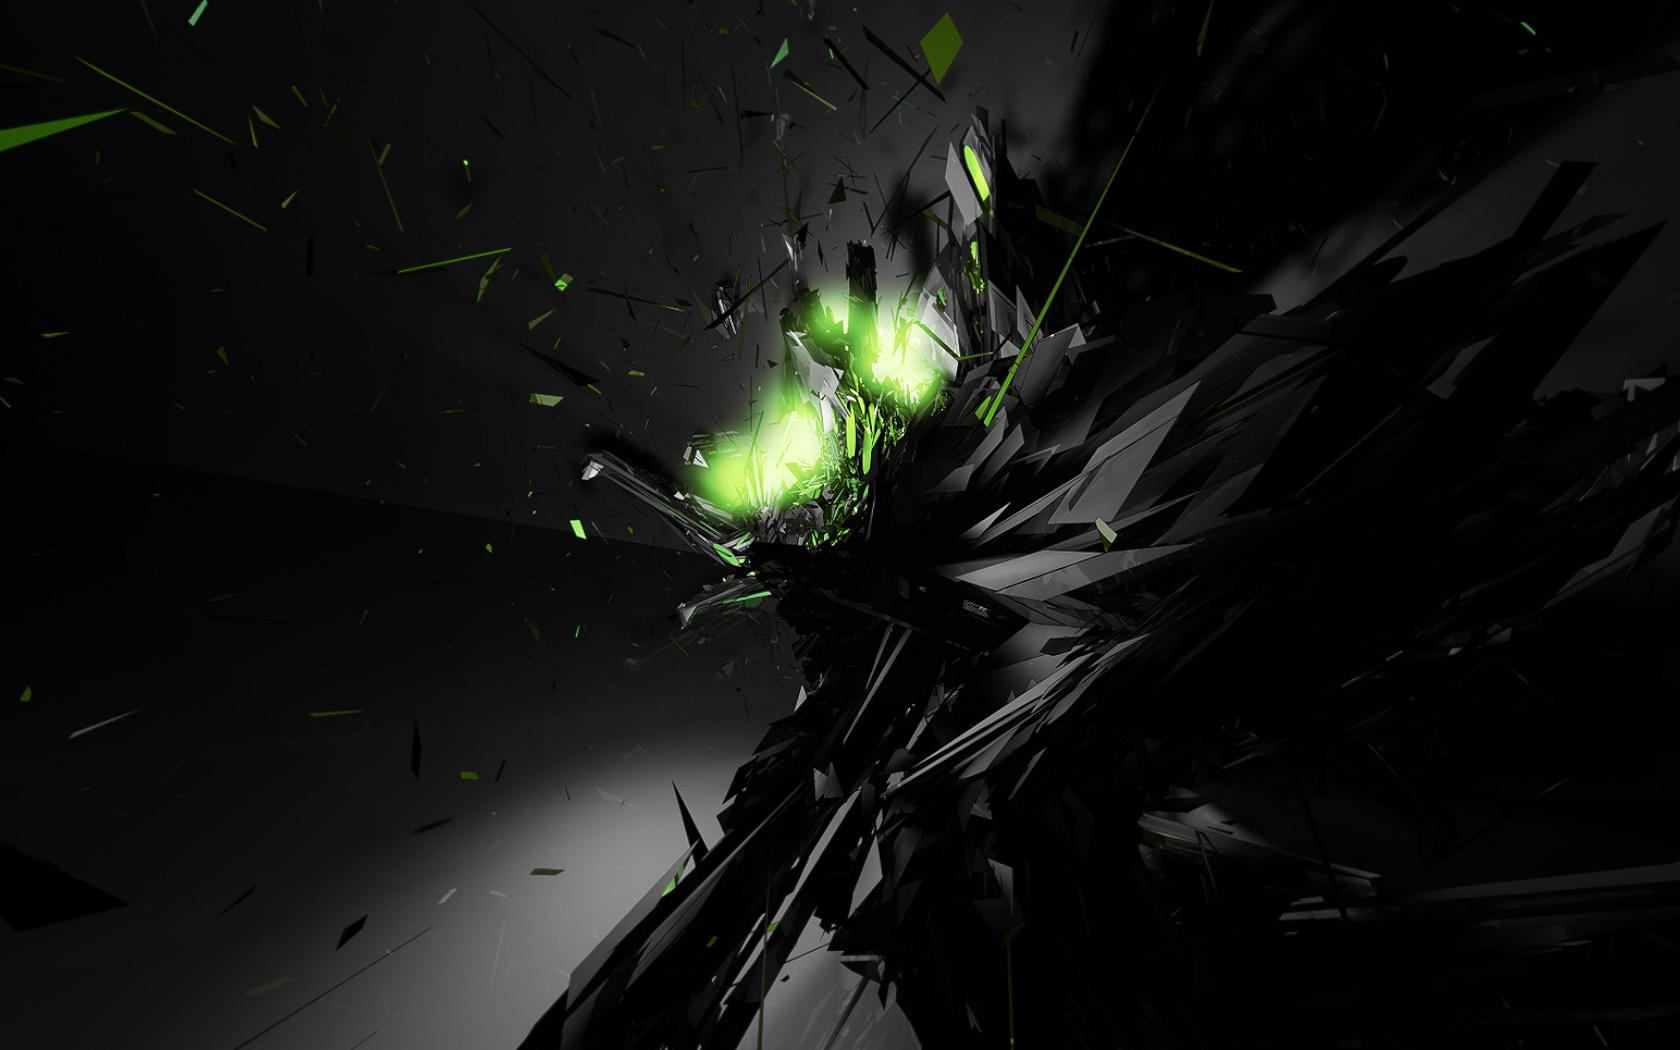 Dark Abstract Wallpaper Download HD Wallpapers 1680x1050